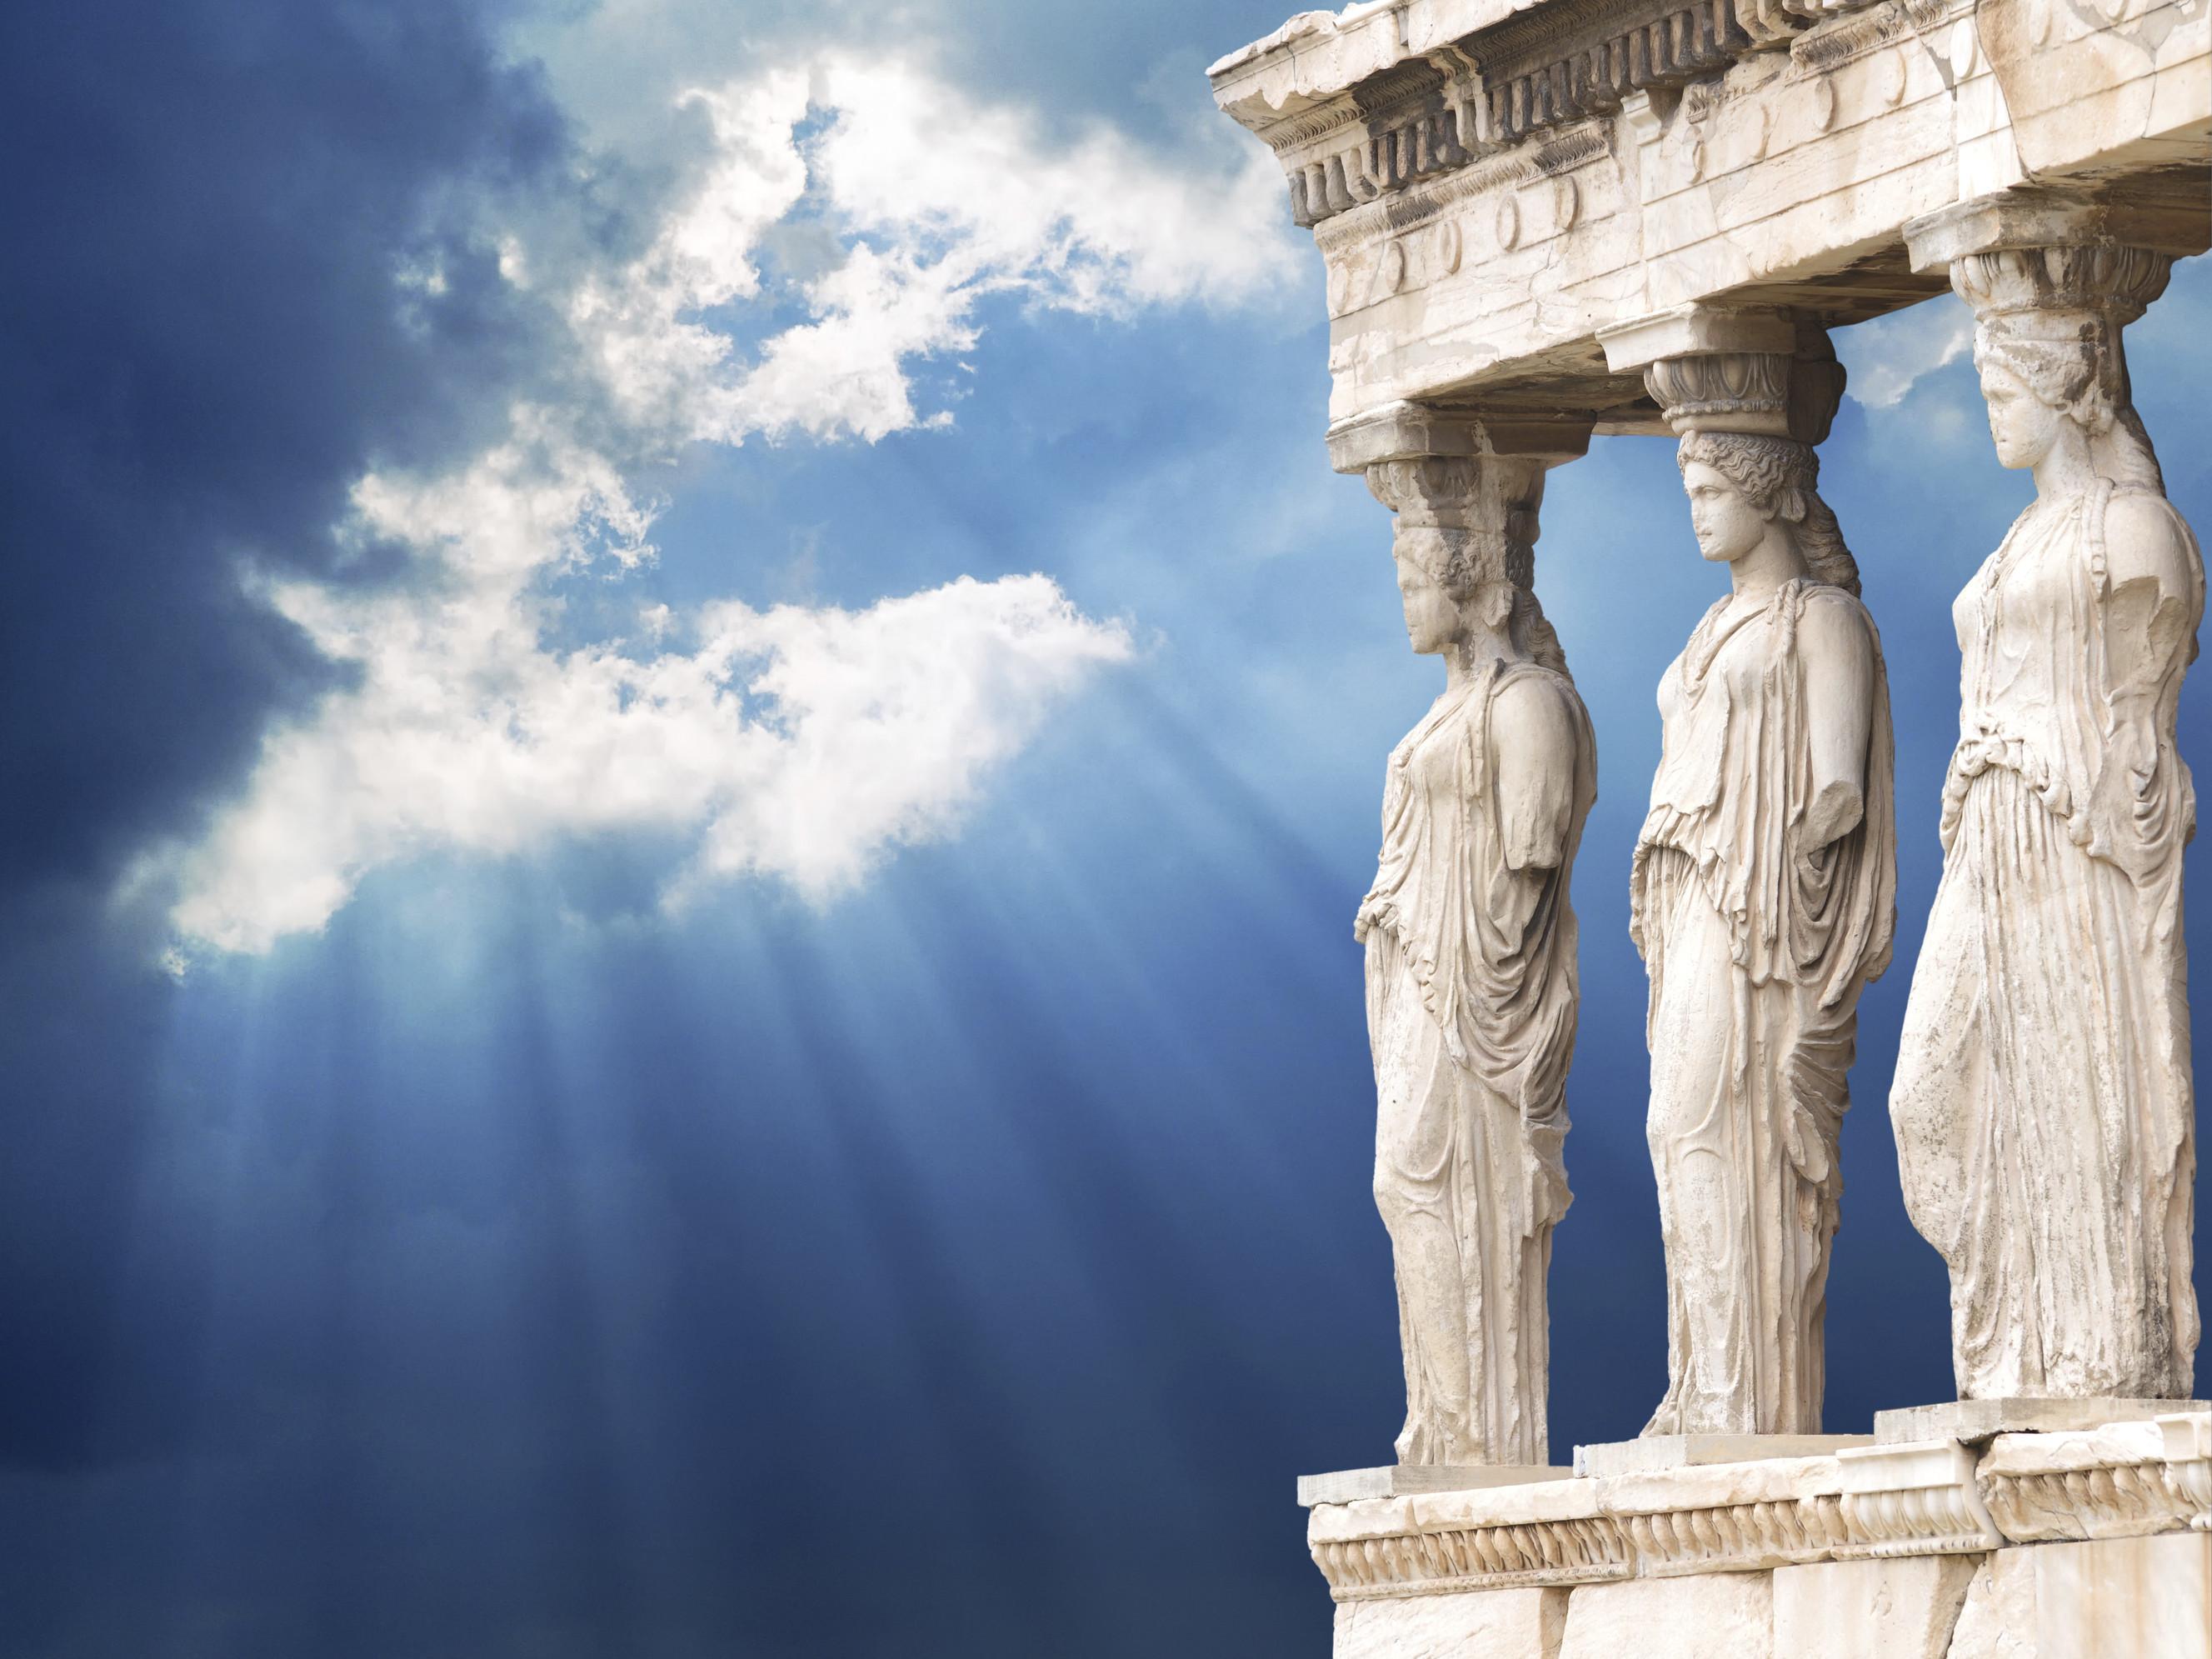 Res: 2655x1991, new-ancient-greek-wallpaper--for-phones-WTG301146